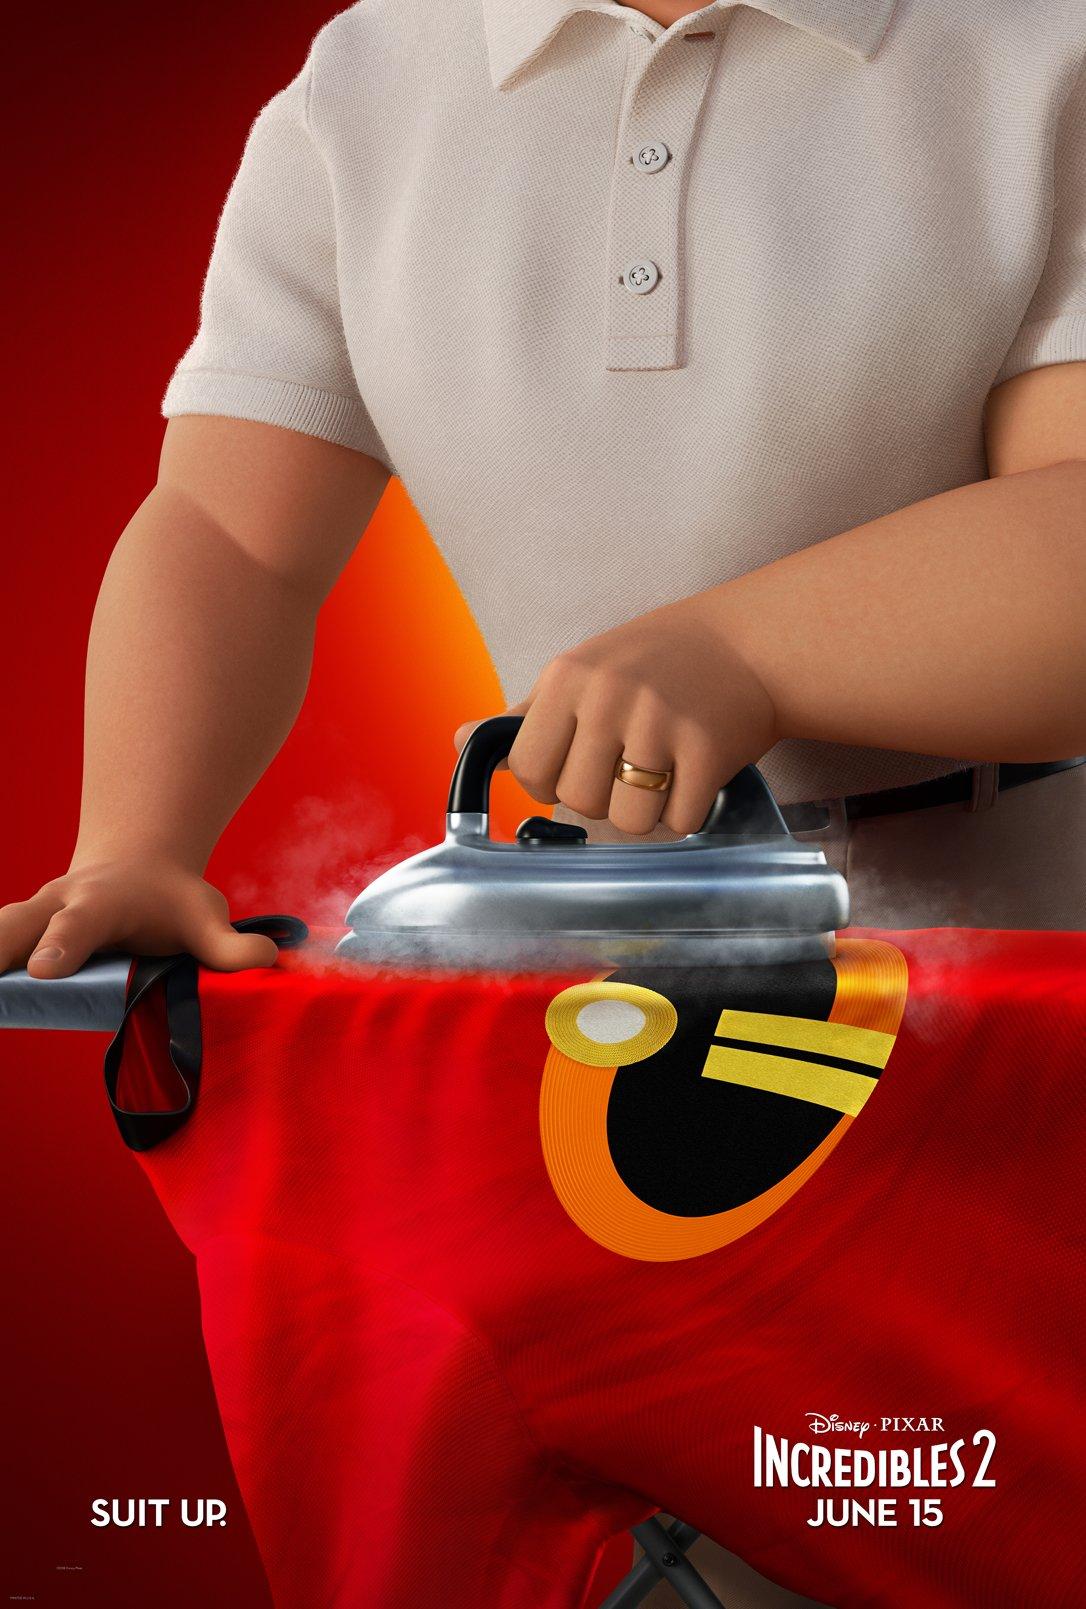 Incredibles 2  DWAkQHKUQAAuz8x